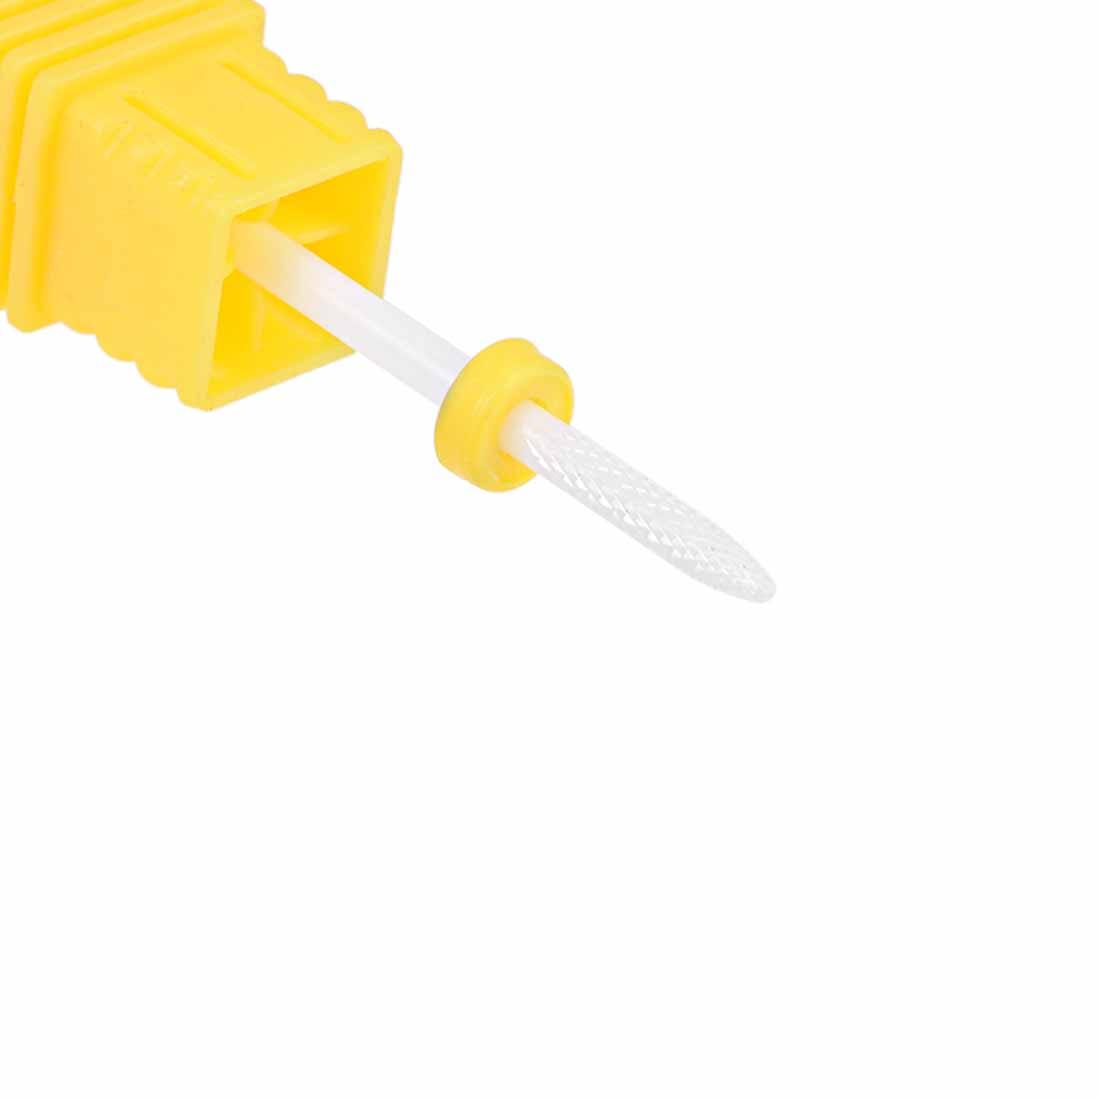 Ceramic Nail Drill Bits 3/32 inch (Extra Fine Grit) for Manicure Pedicure